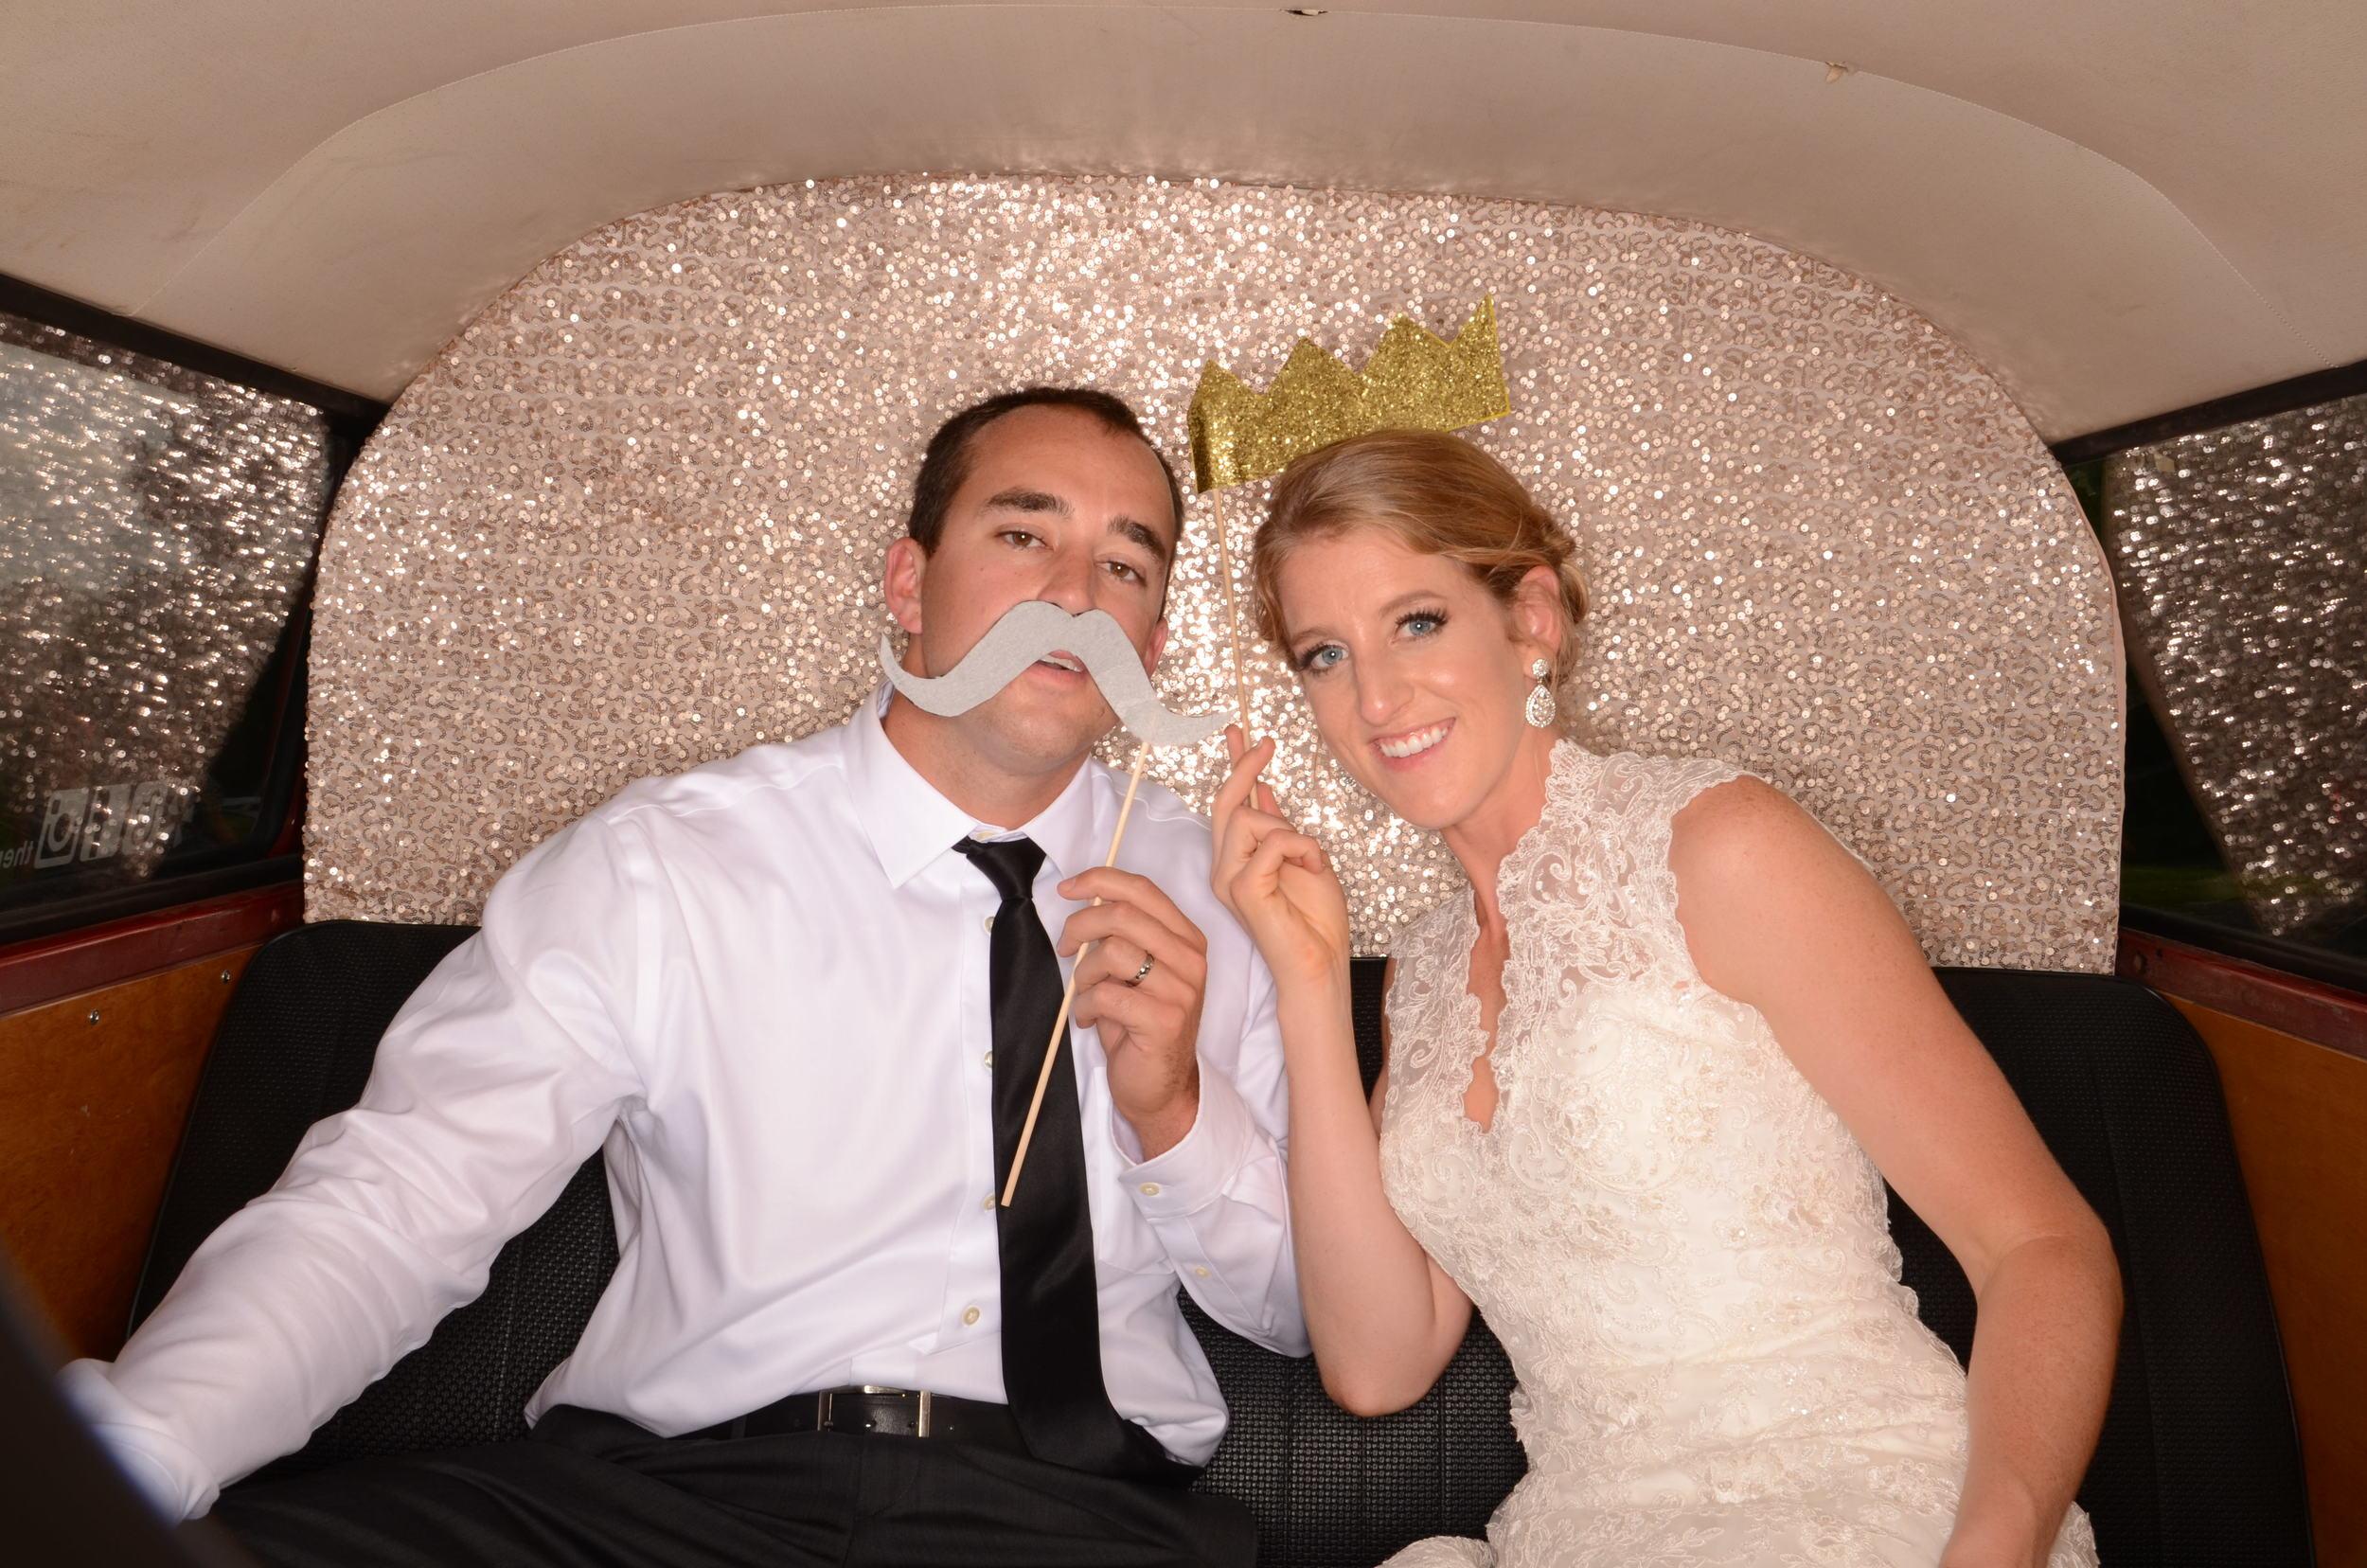 fun-wedding-photobooth-kc-the-photo-bus